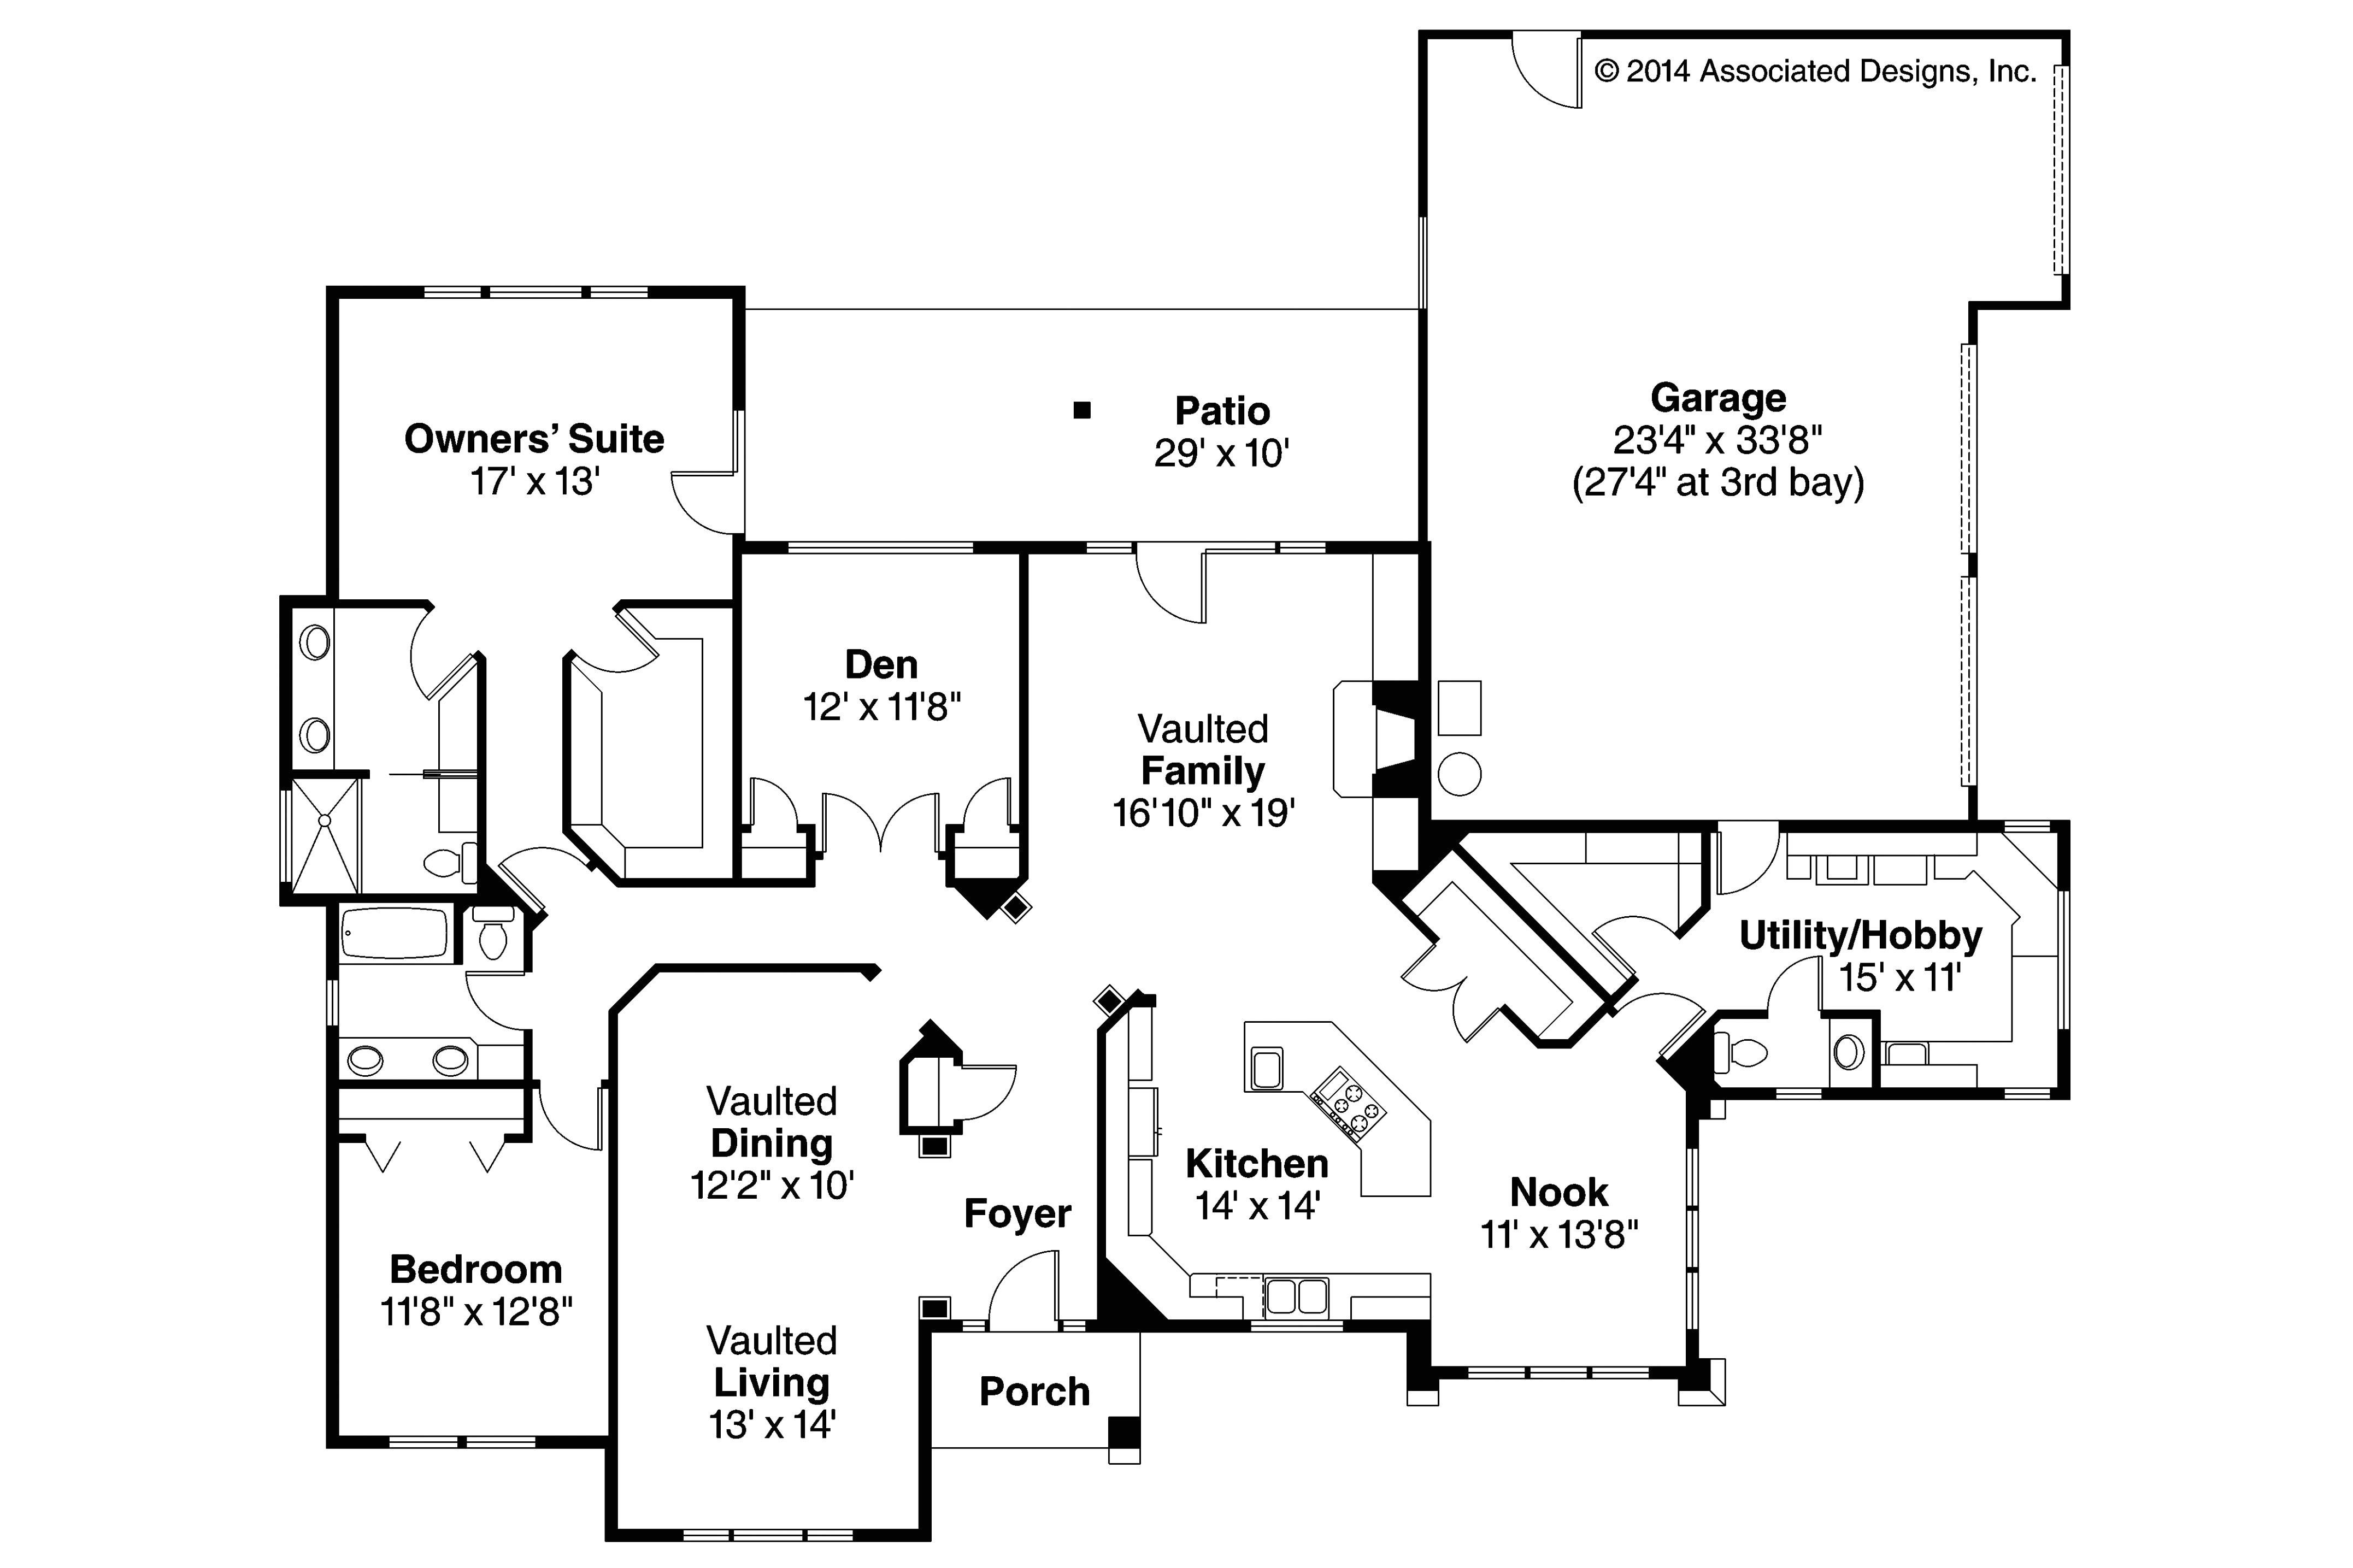 hgtv dream home 2014 floor plan awesome 2014 hgtv dream home floor plan new hgtv smart home 2018 floor plan